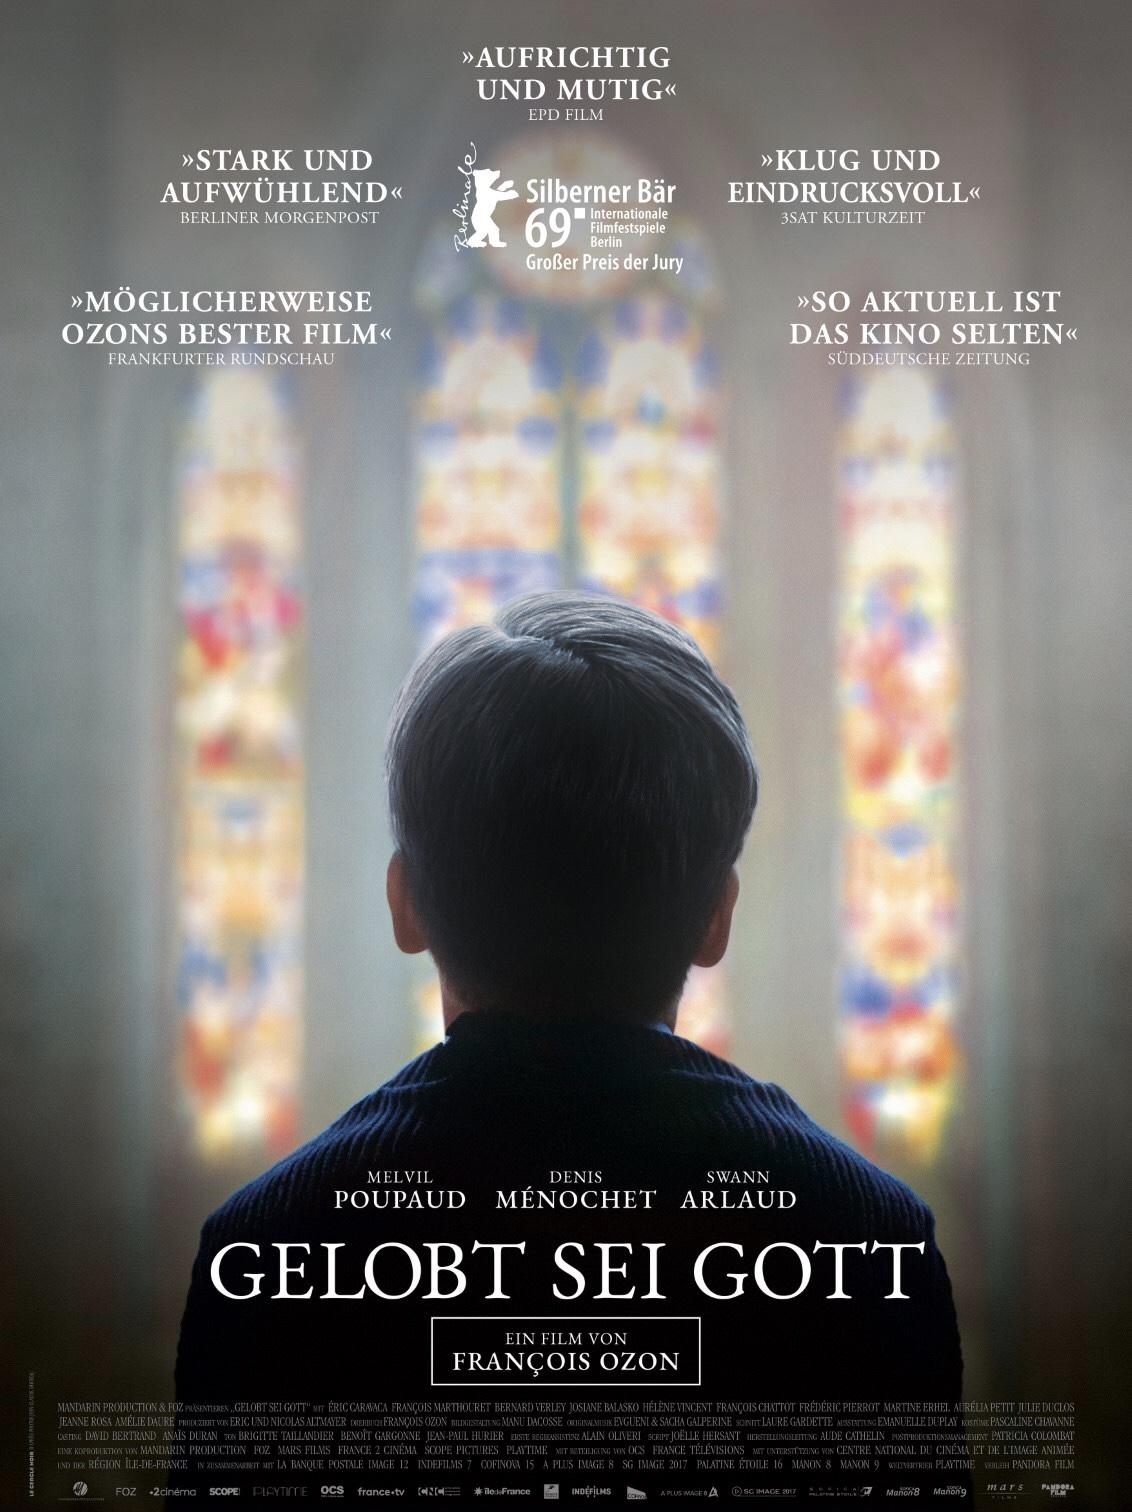 Film am 21. Dezember 2020 – abgesagt!